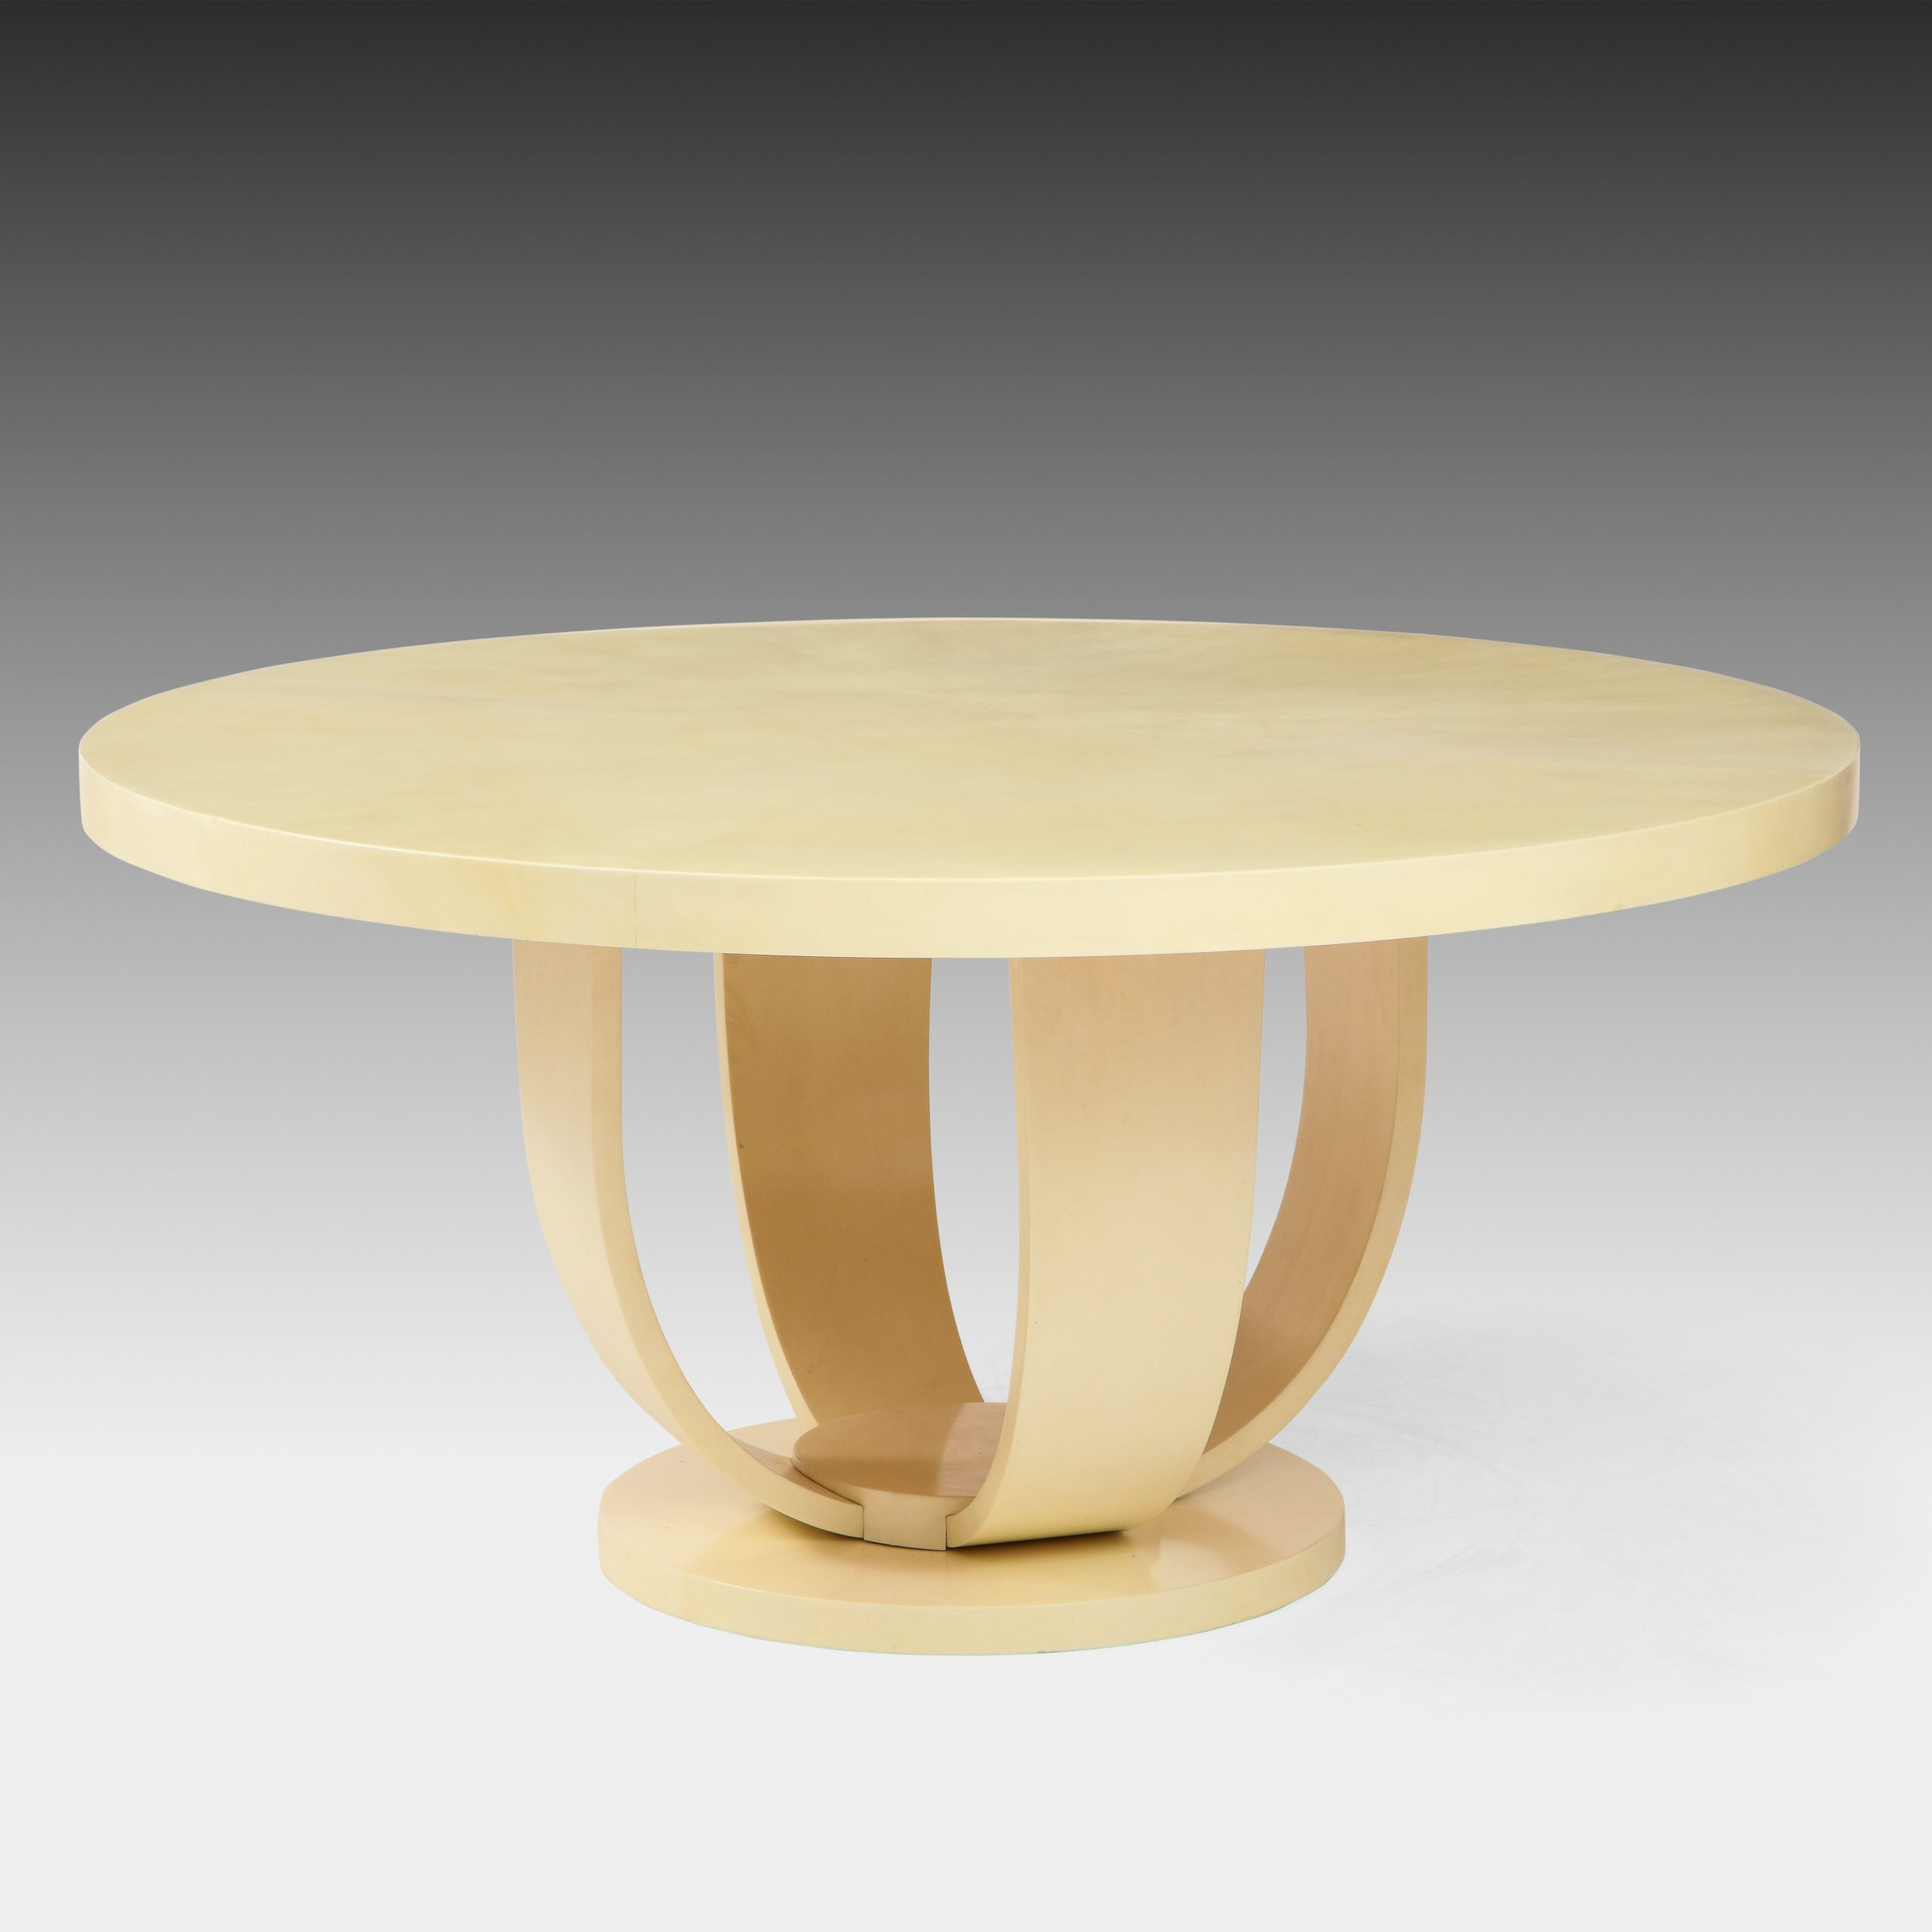 Ivory Goatskin Center or Dining Table by Aldo Tura | soyun k.